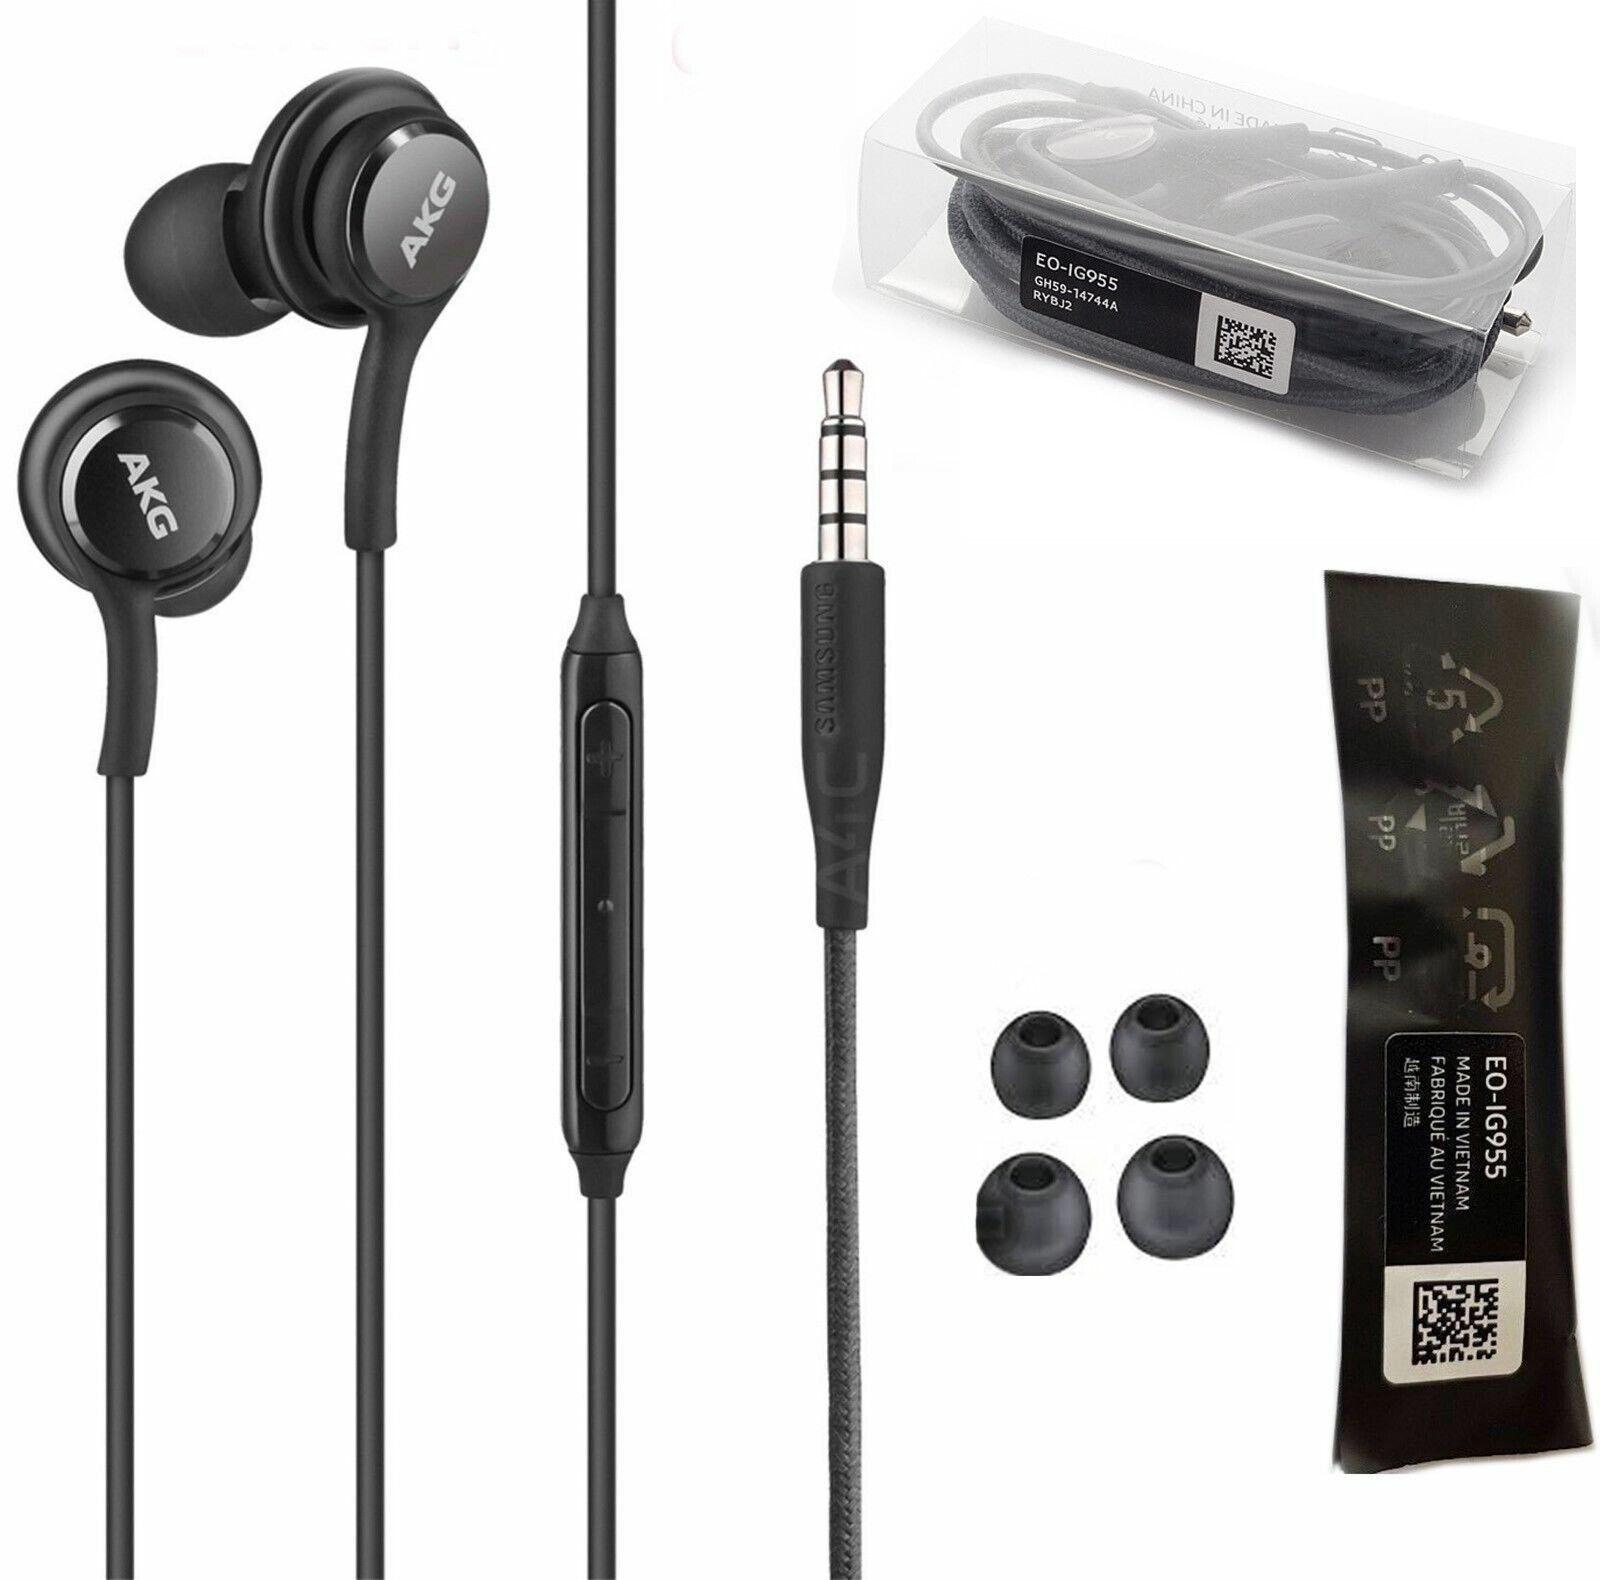 Orginal Genuine Samsung AKG Stereo Headphones Handsfree Earp